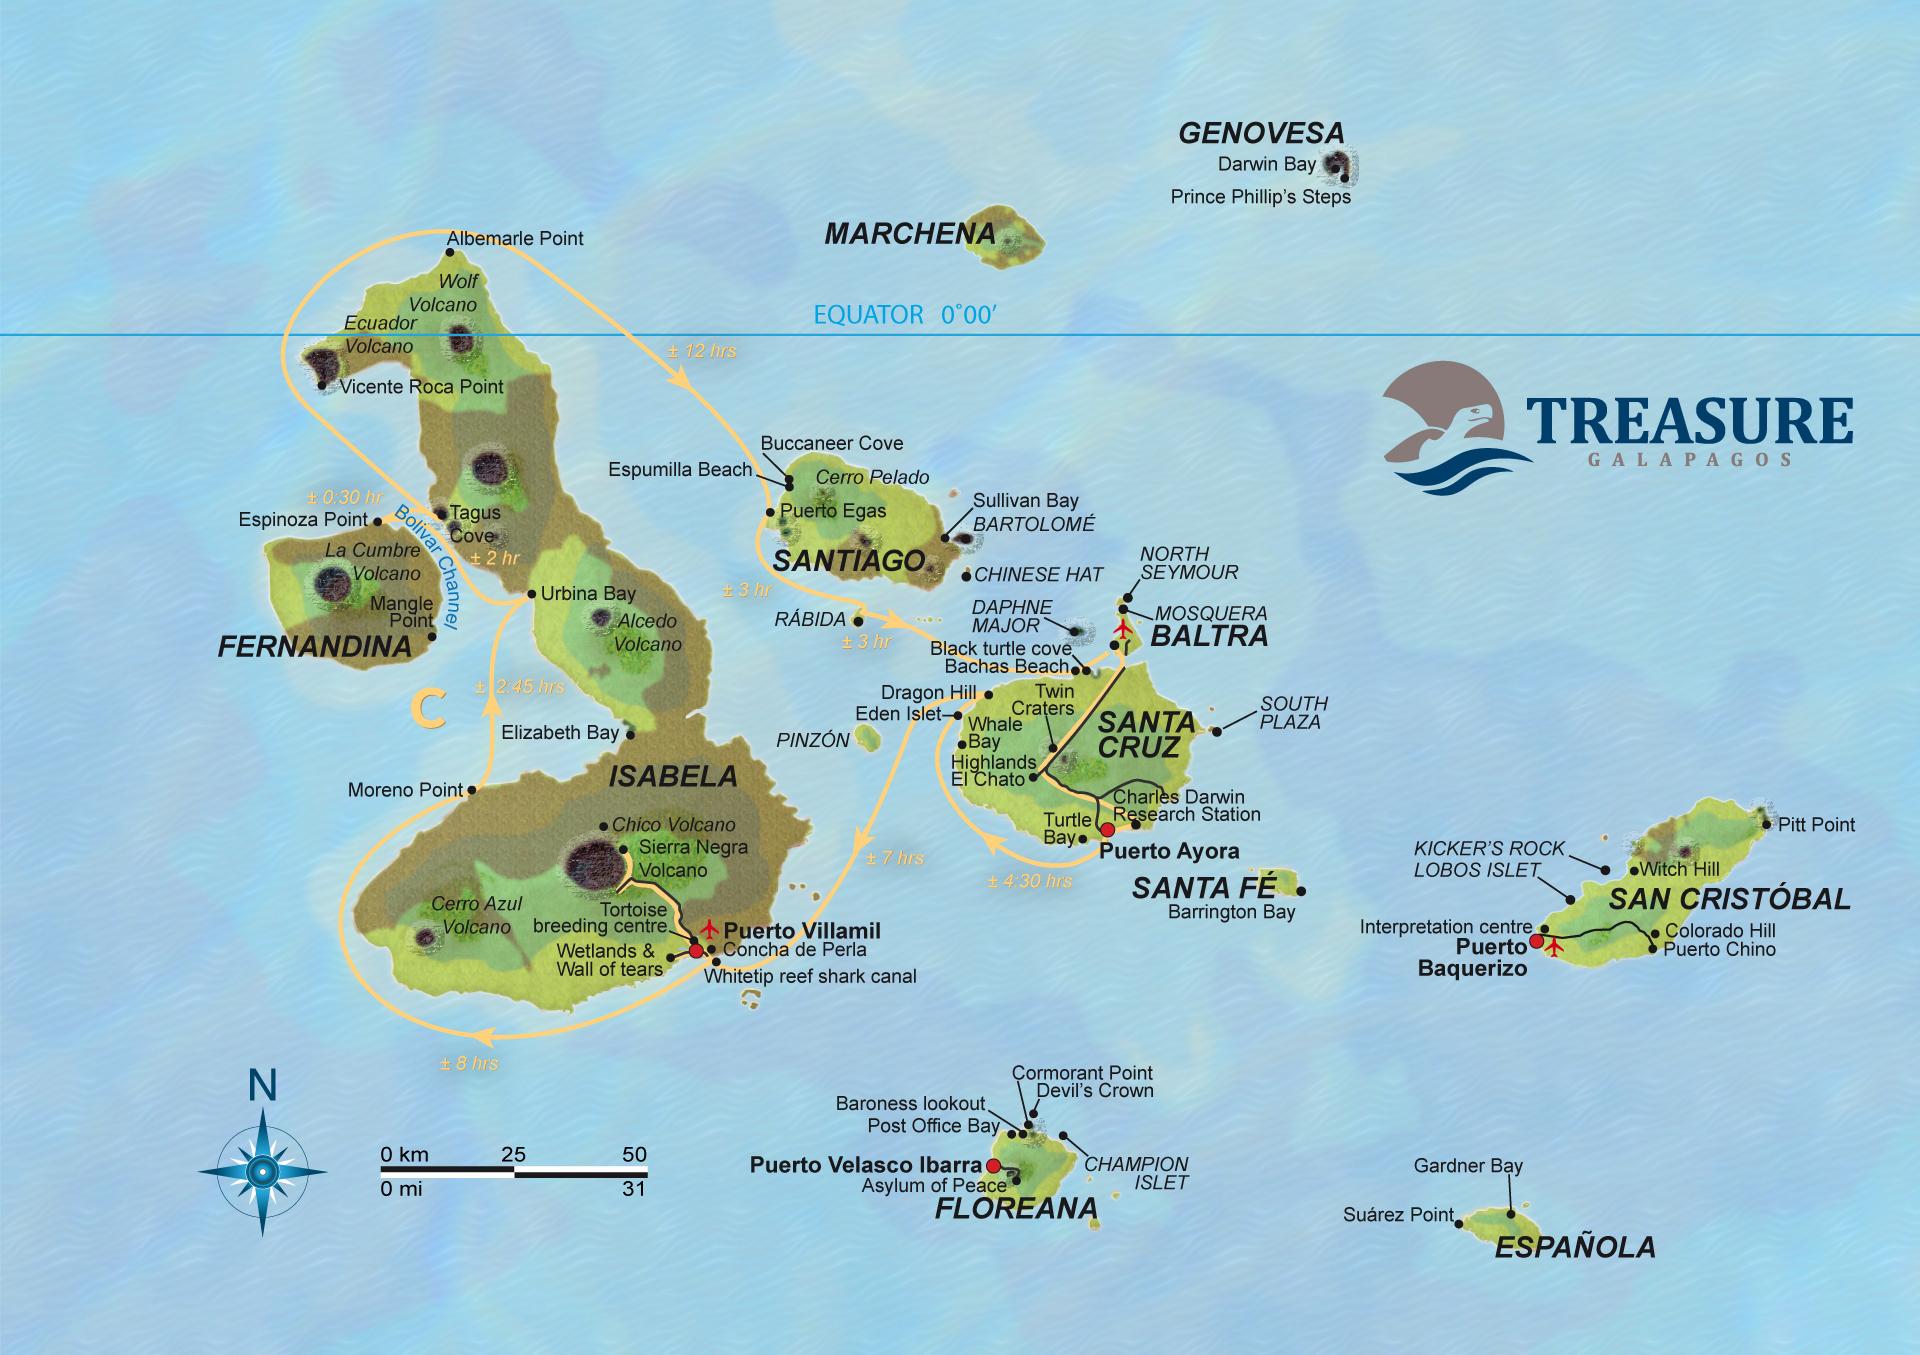 Treasure of Galapagos IT C